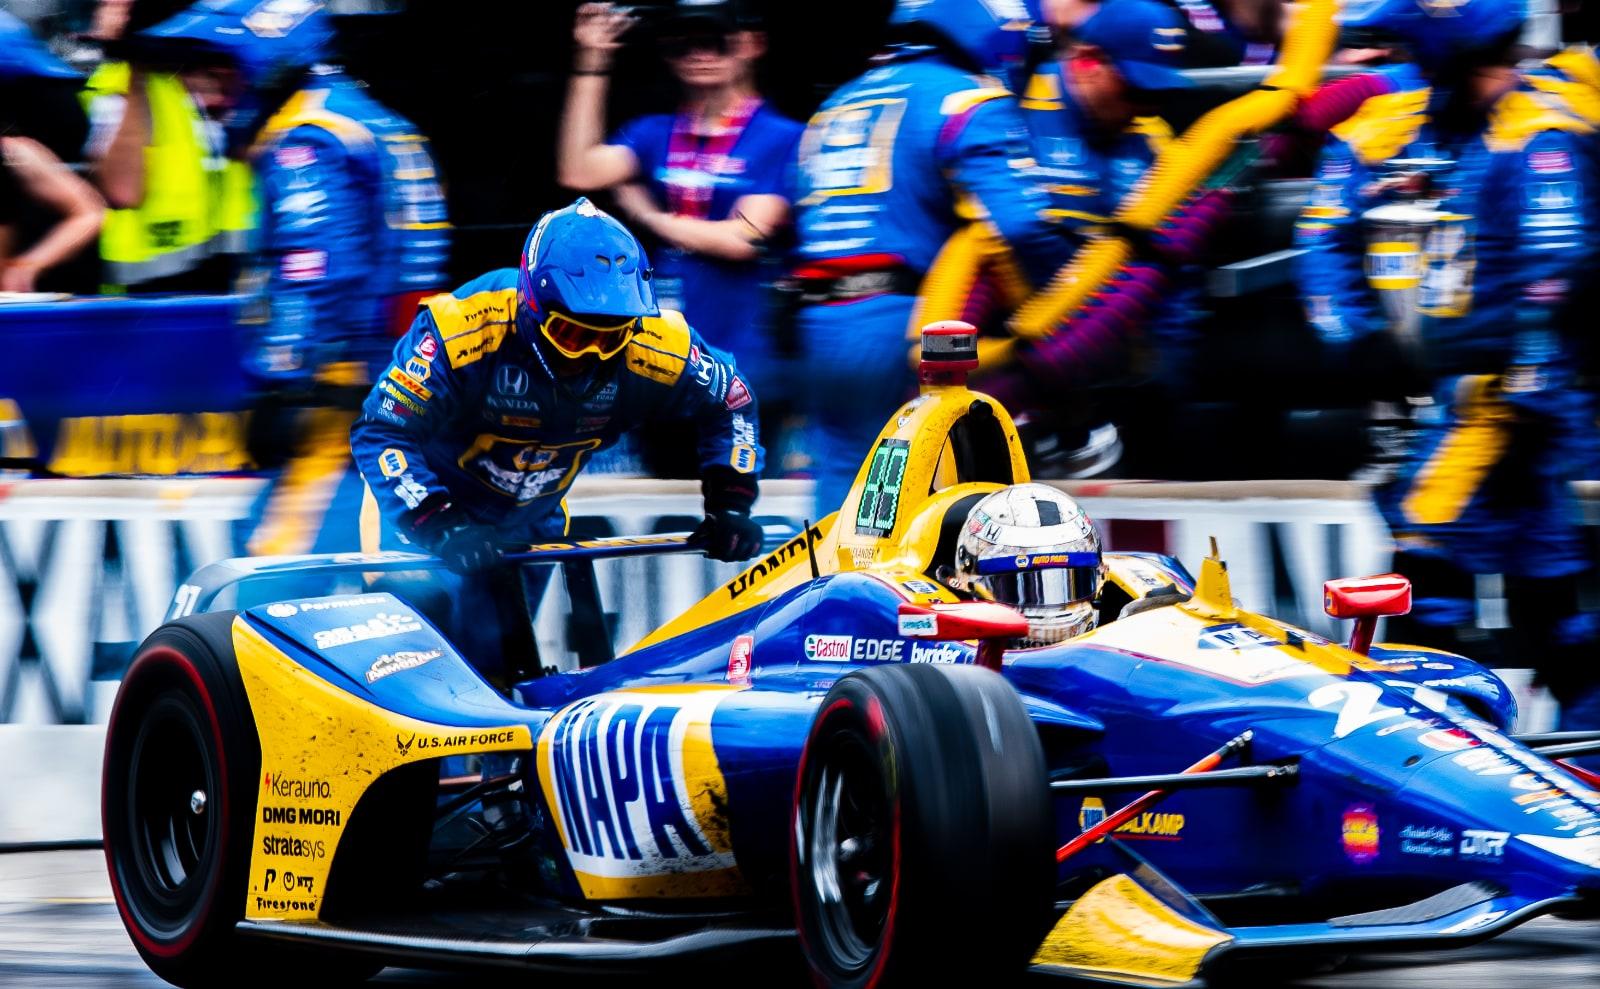 NAPA Andretti Autosport crew finish Rossi pit stop in 2019 Indy 500